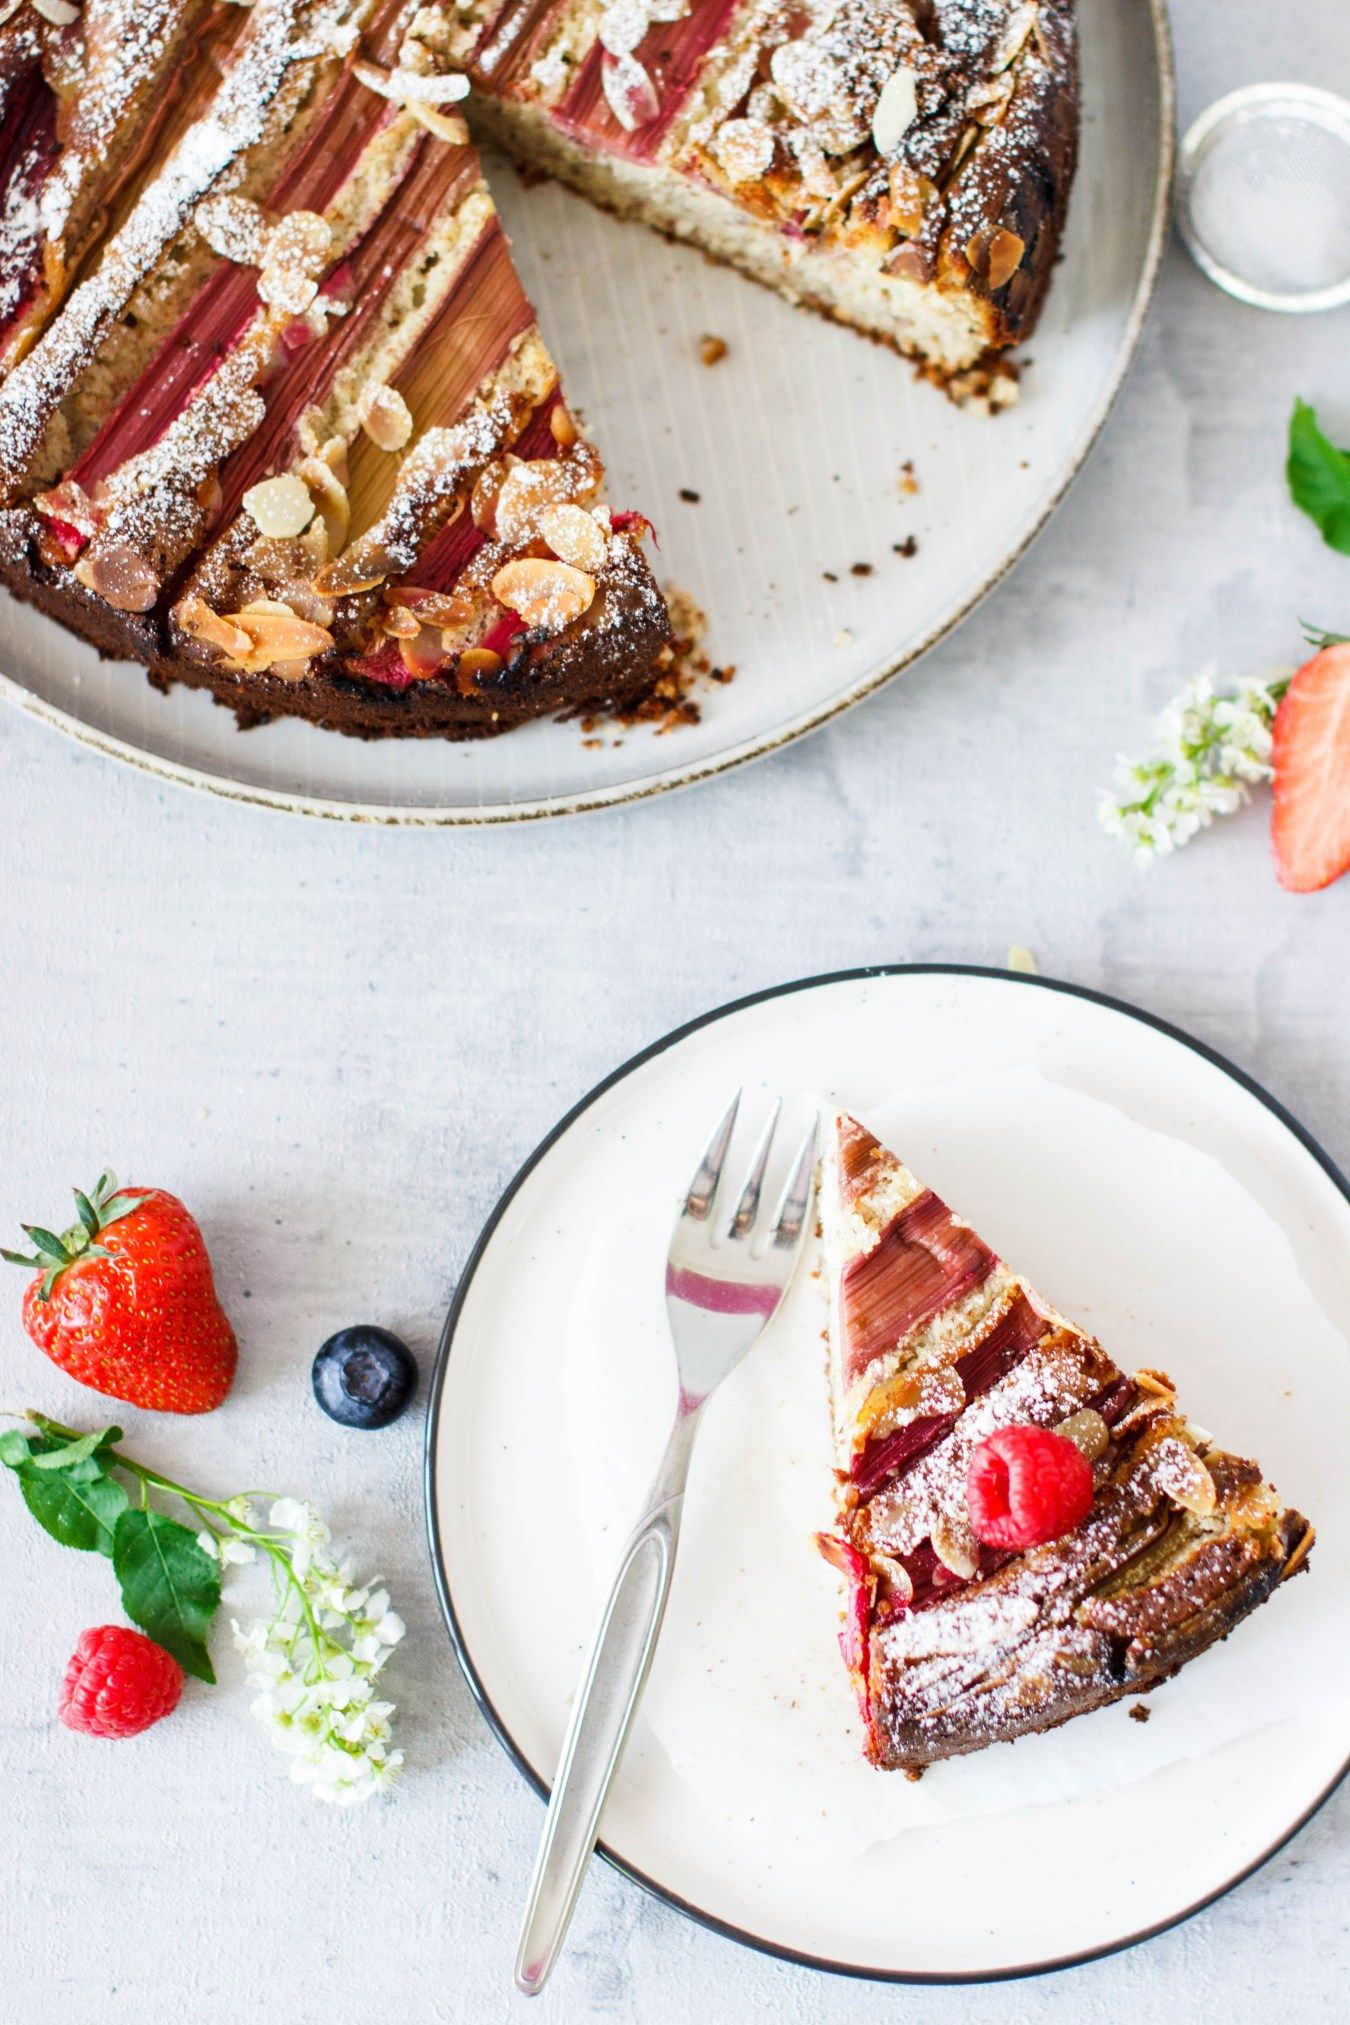 Mandel Ricotta Kuchen Mit Rhabarber Rezept Rezepte Lebensmittel Essen Rhabarber